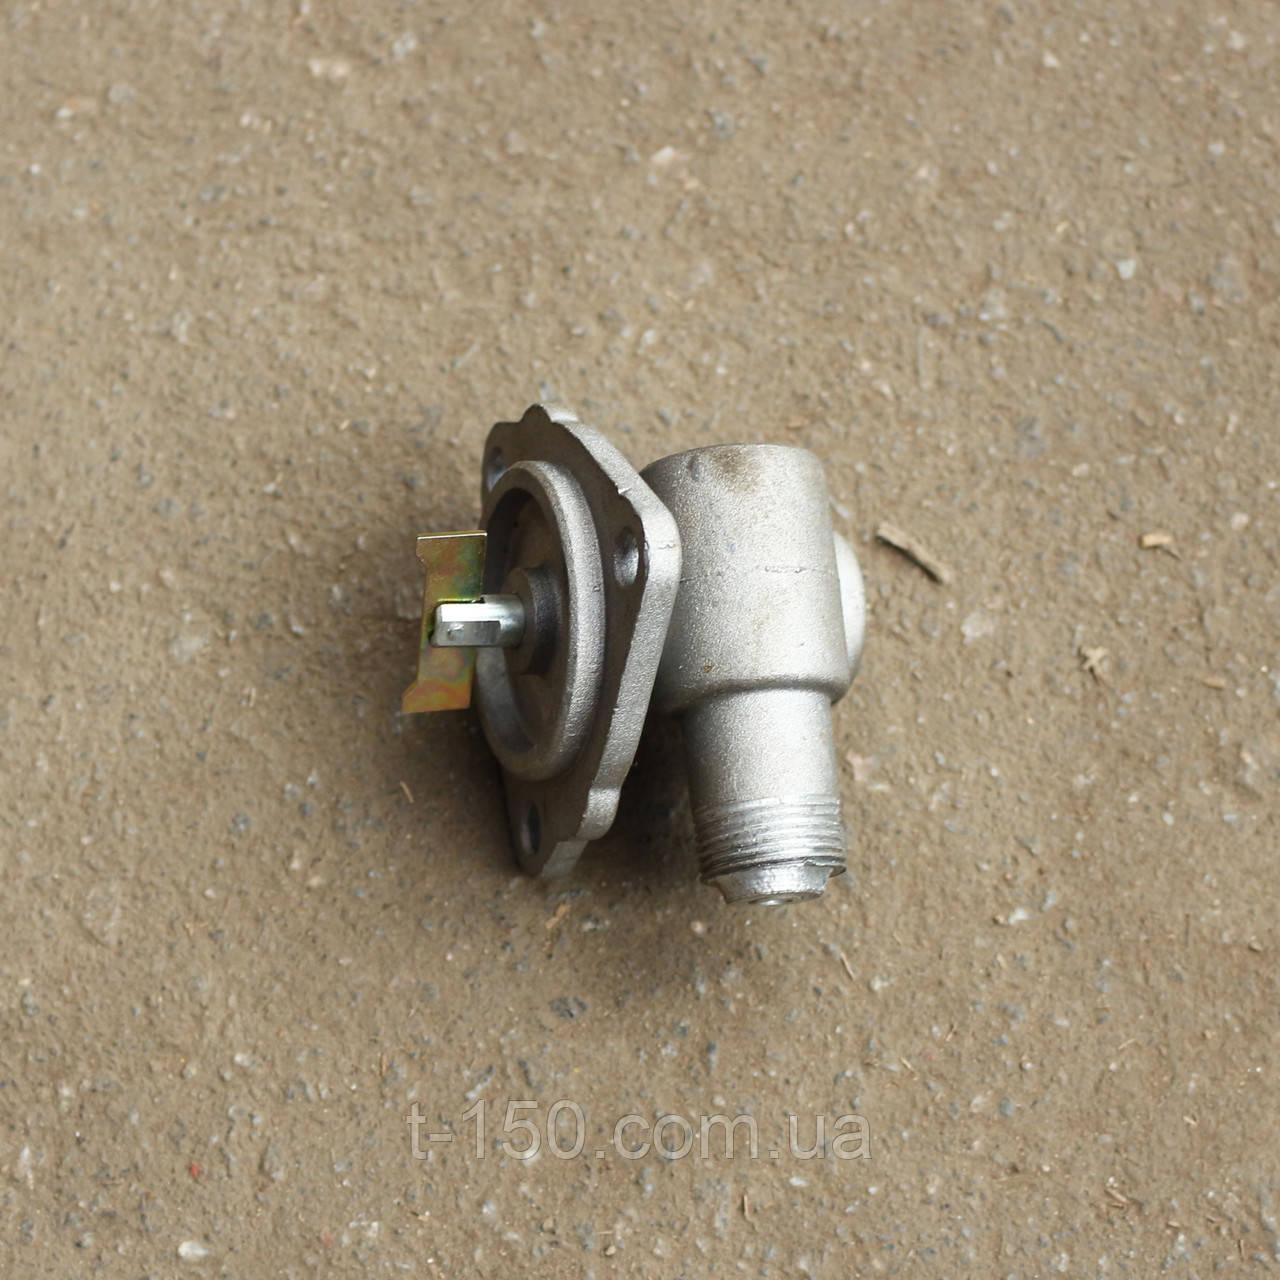 Привод тахоспидометра Д-240, МТЗ-80 (2400 об/мин) (ПТ-3802010-90) производство БЗА